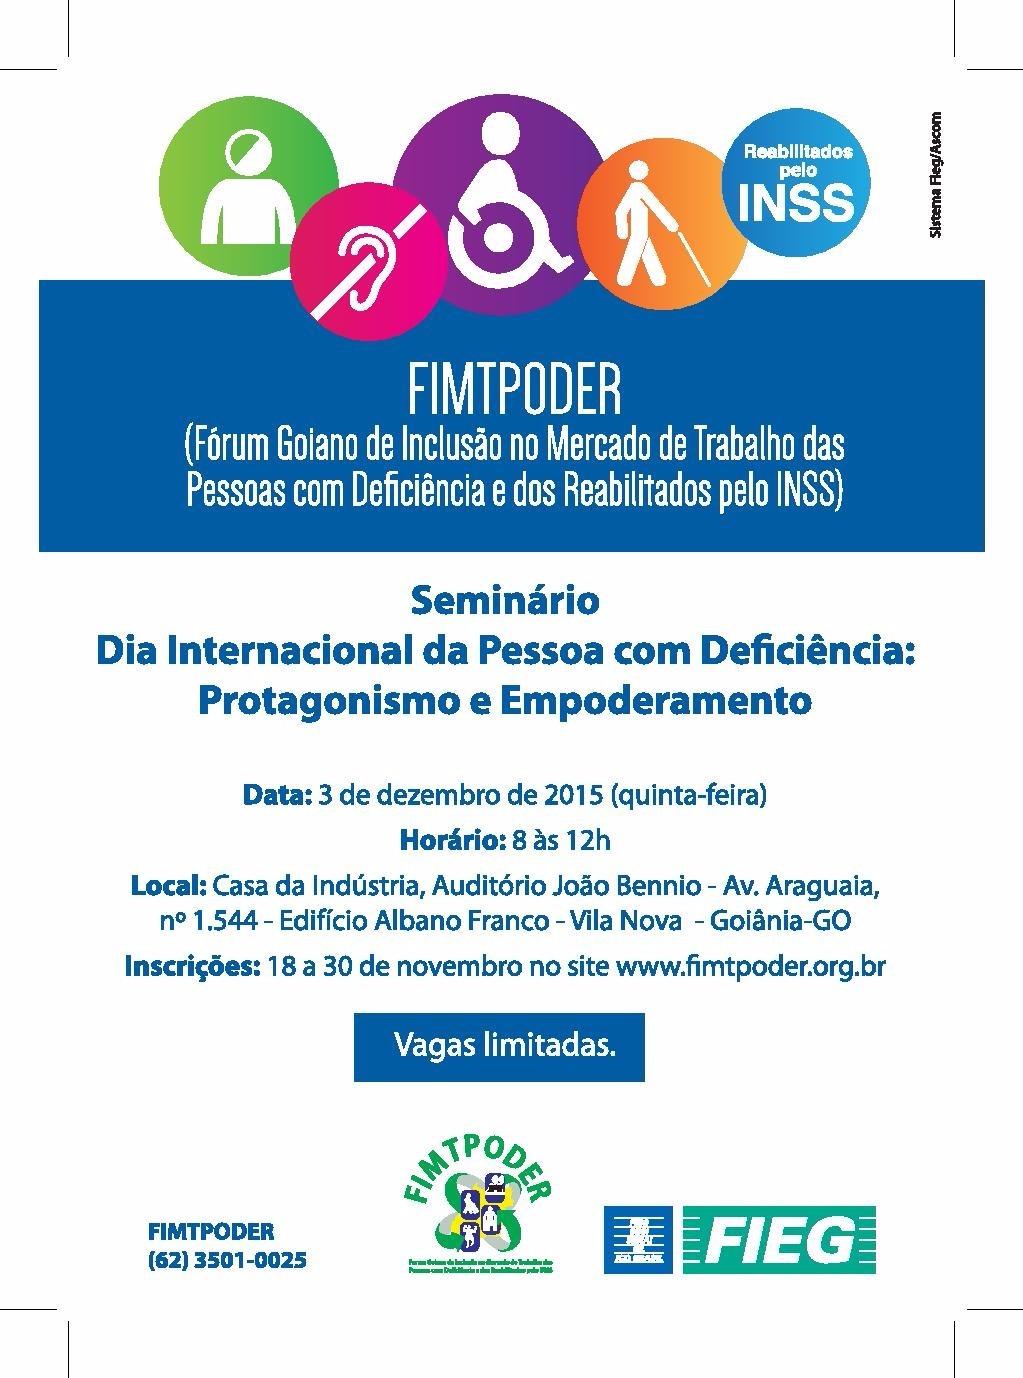 seminario-fintpoder-3-dezembro